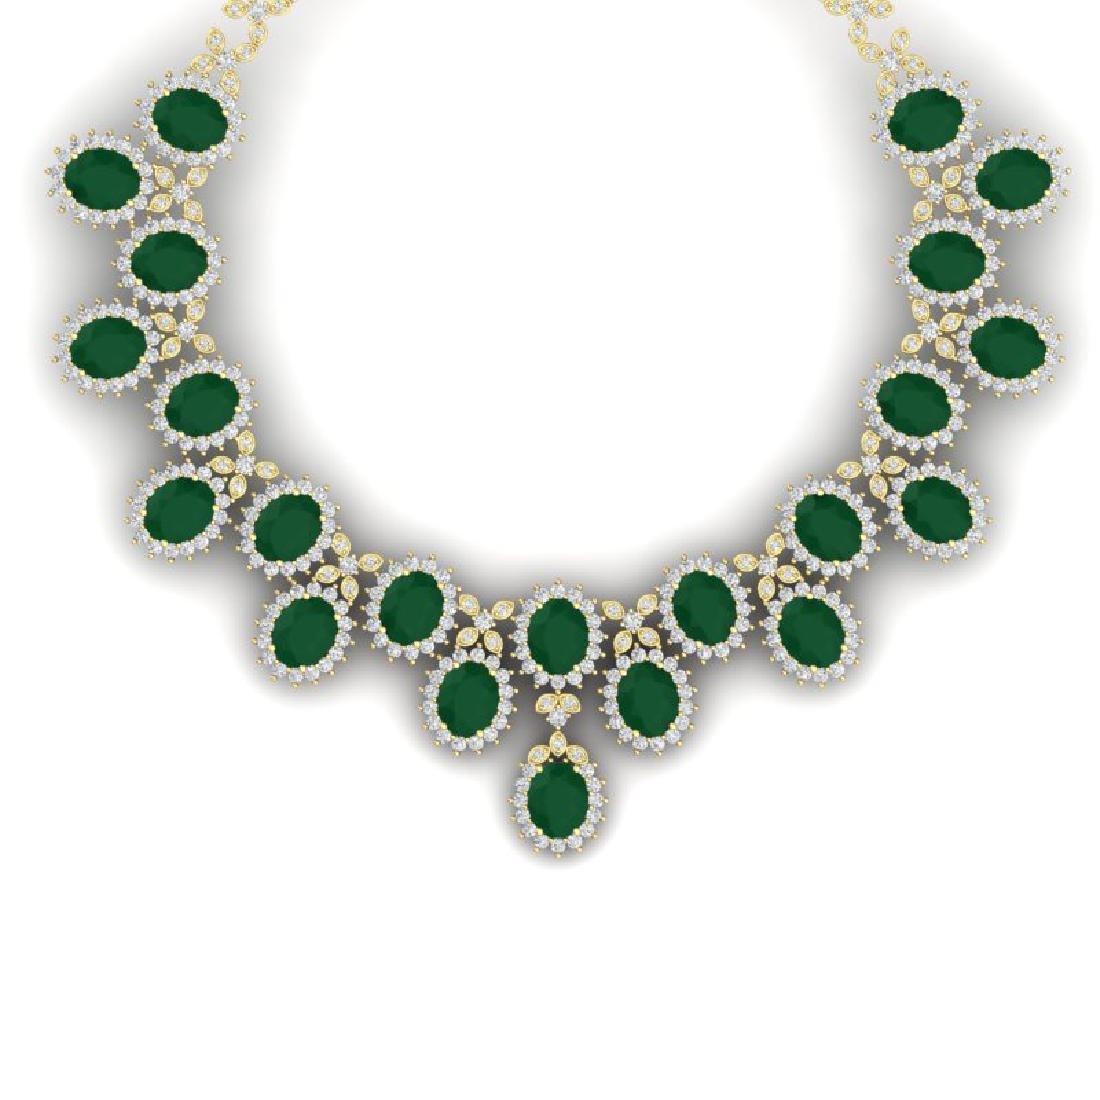 81 CTW Royalty Emerald & VS Diamond Necklace 18K Yellow